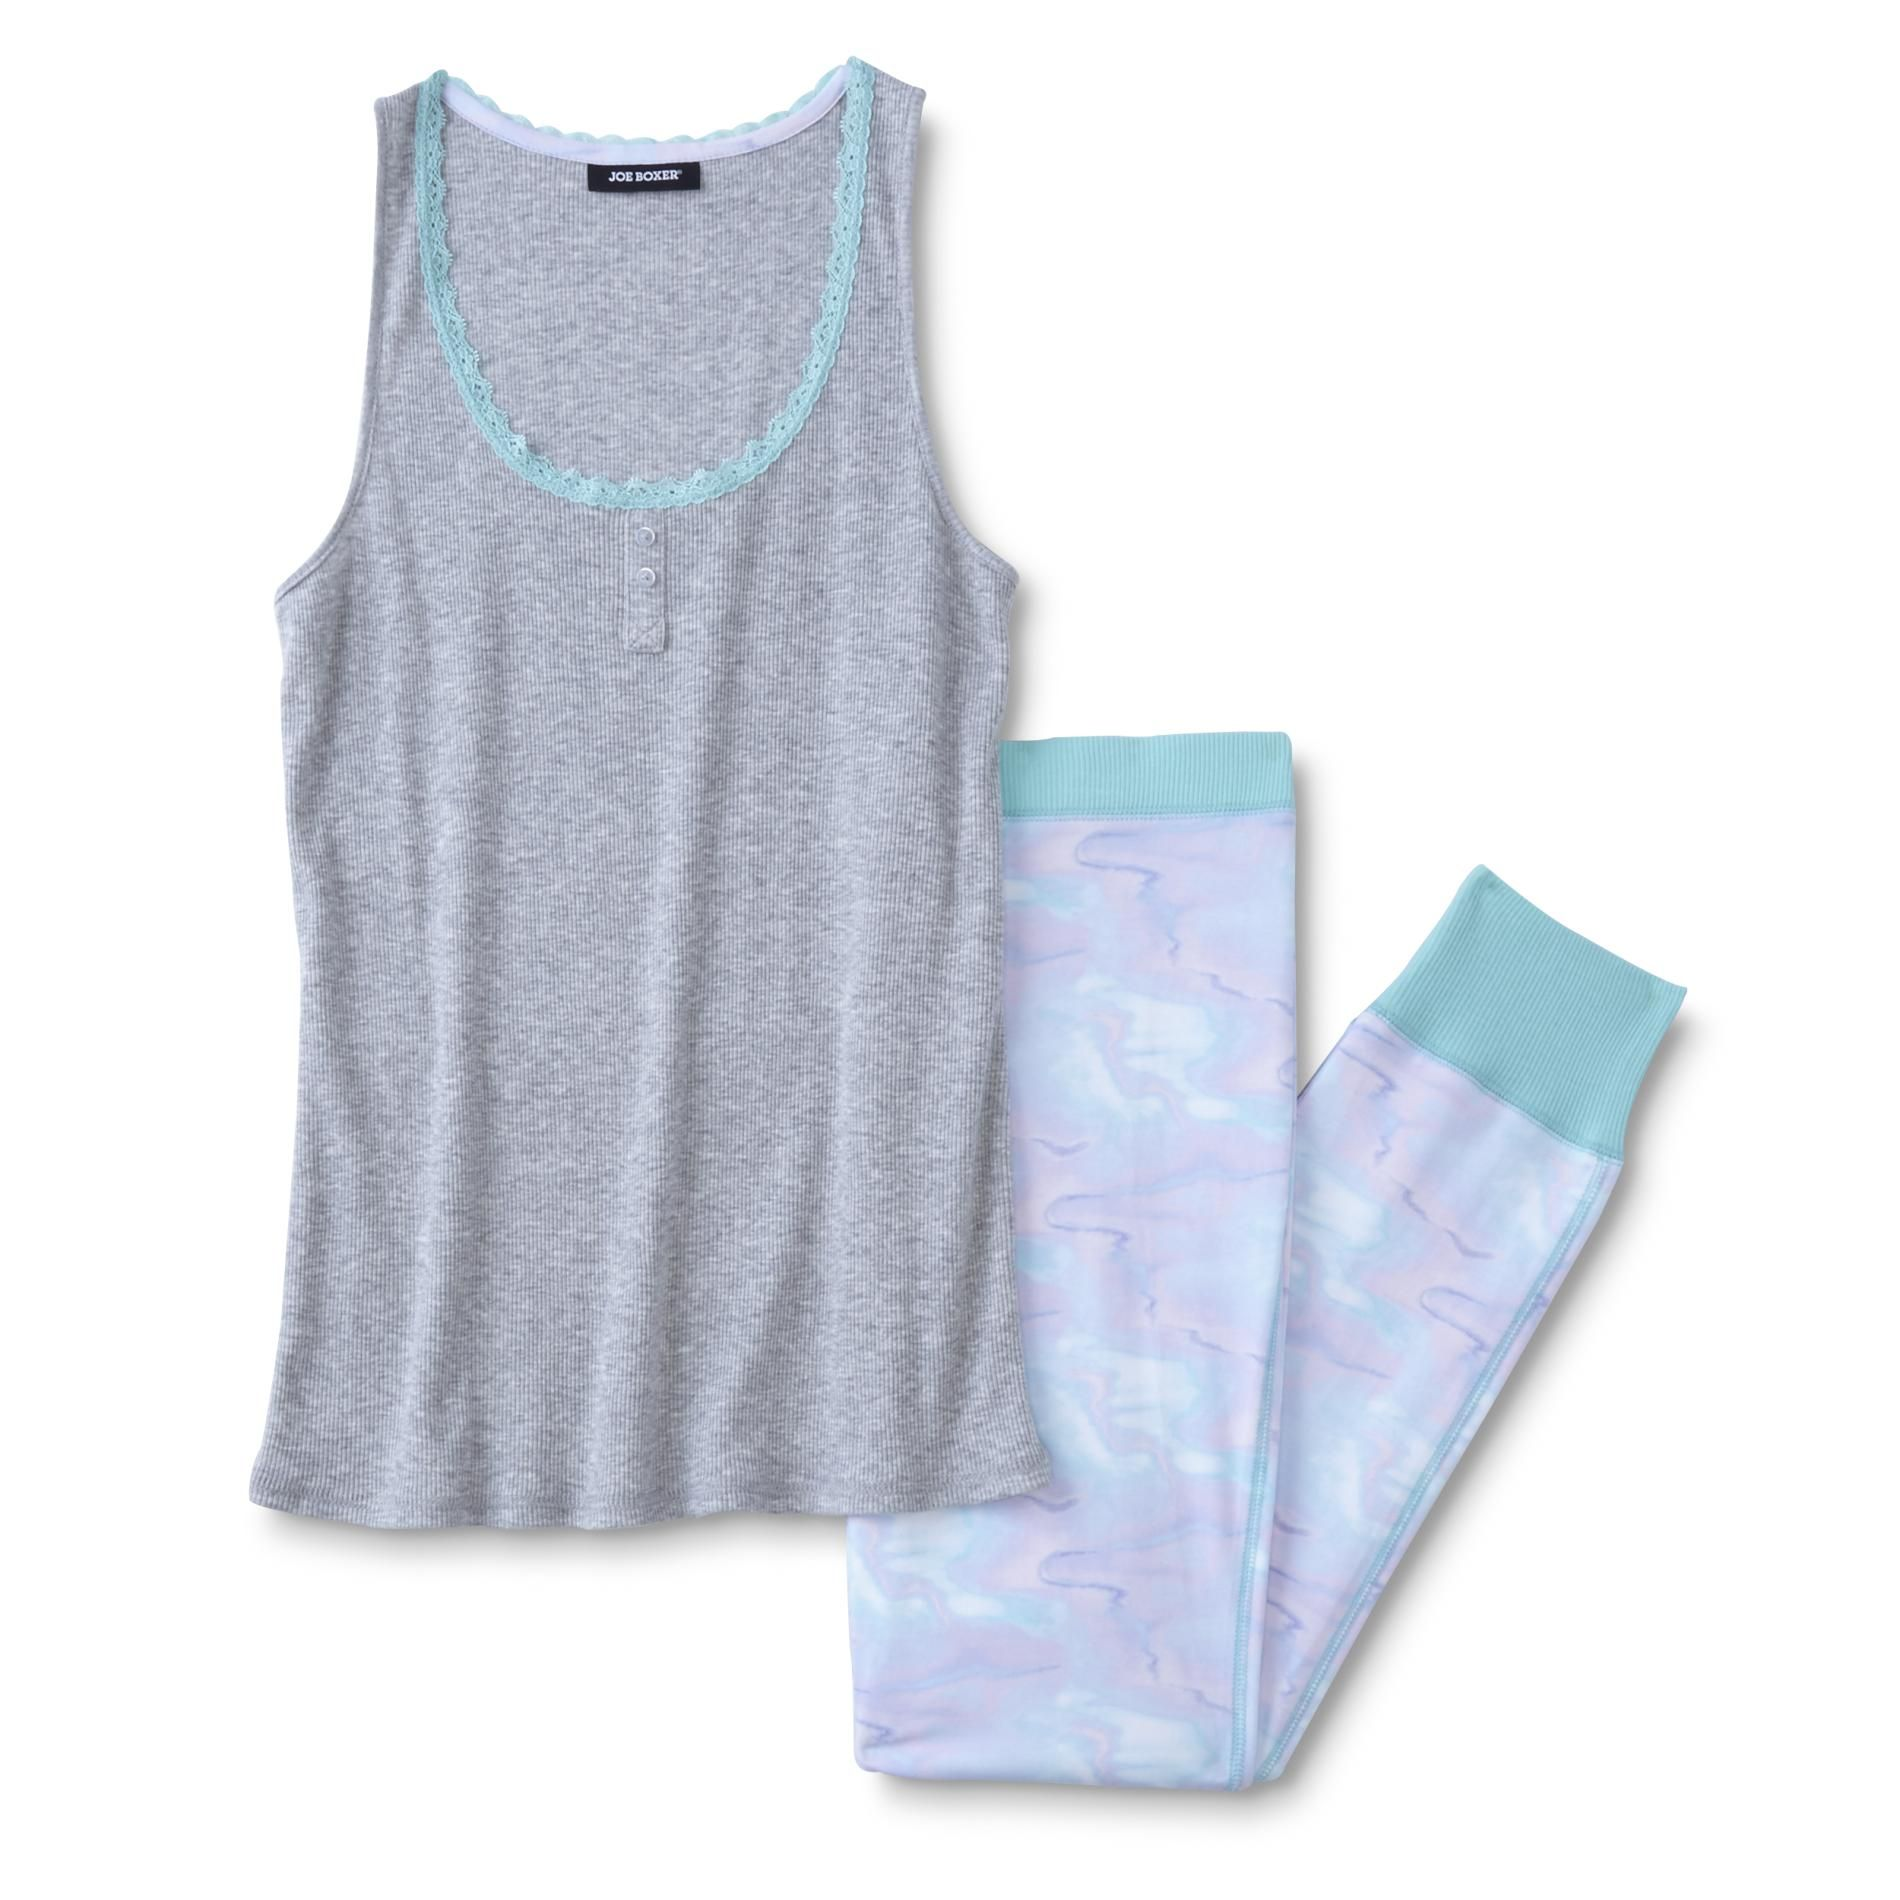 975d36193a6 Joe Boxer Women s Pajama Tank Top   Pants - Watercolor